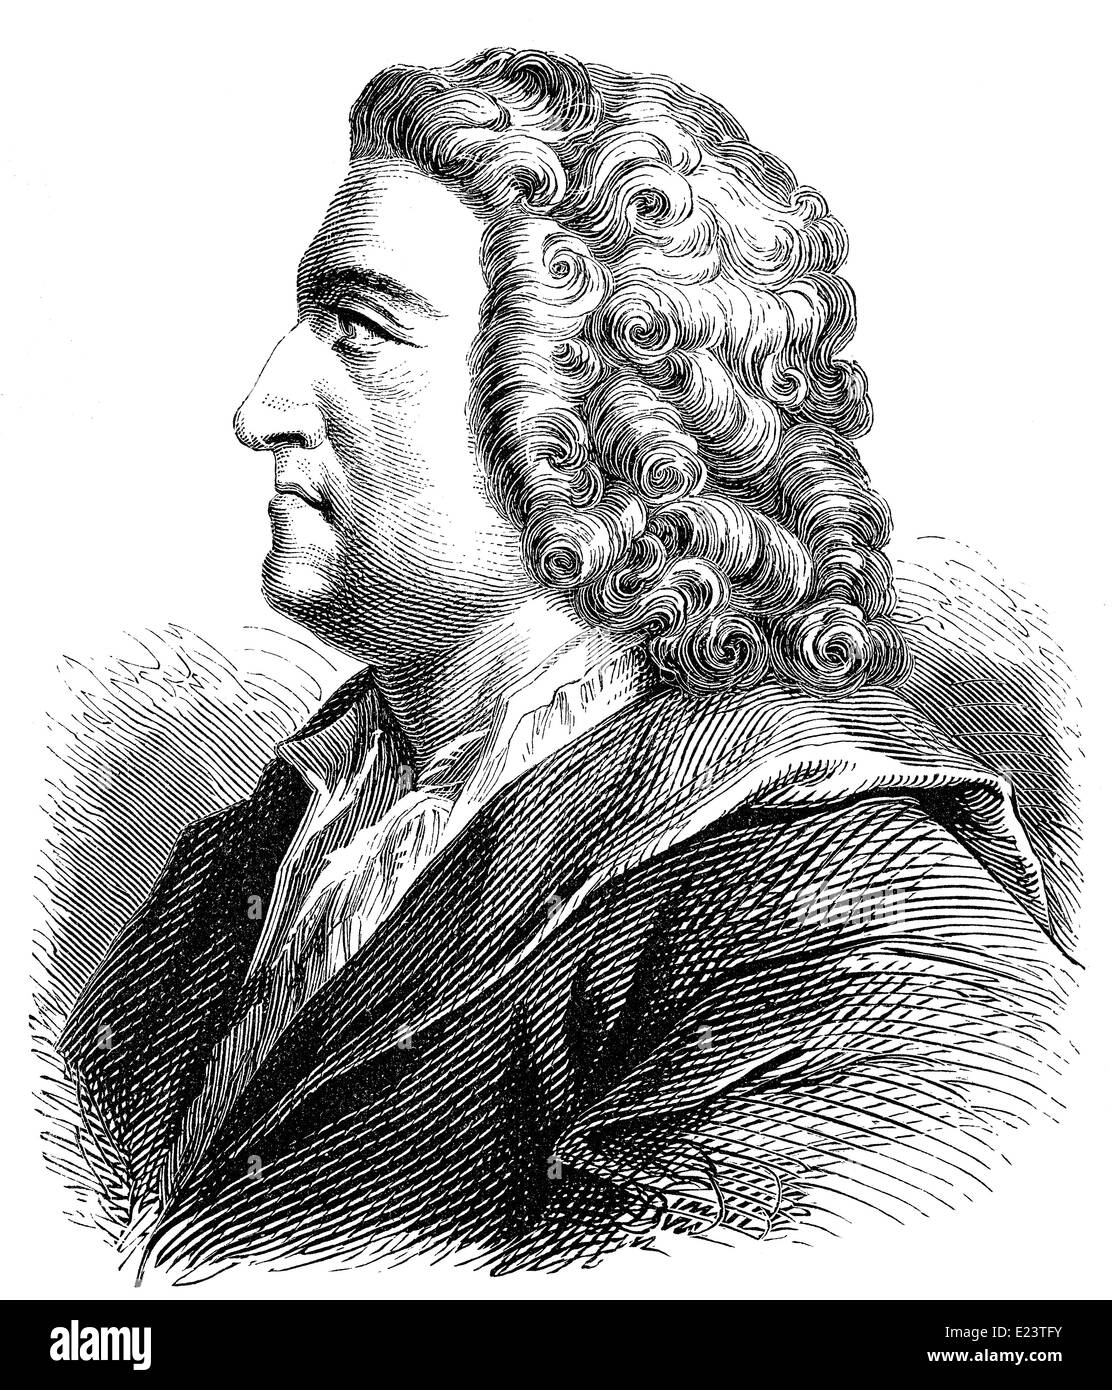 Johann Friedrich Böttger or Böttcher, Böttiger, 1682 - 1719, a German alchemist, - Stock Image